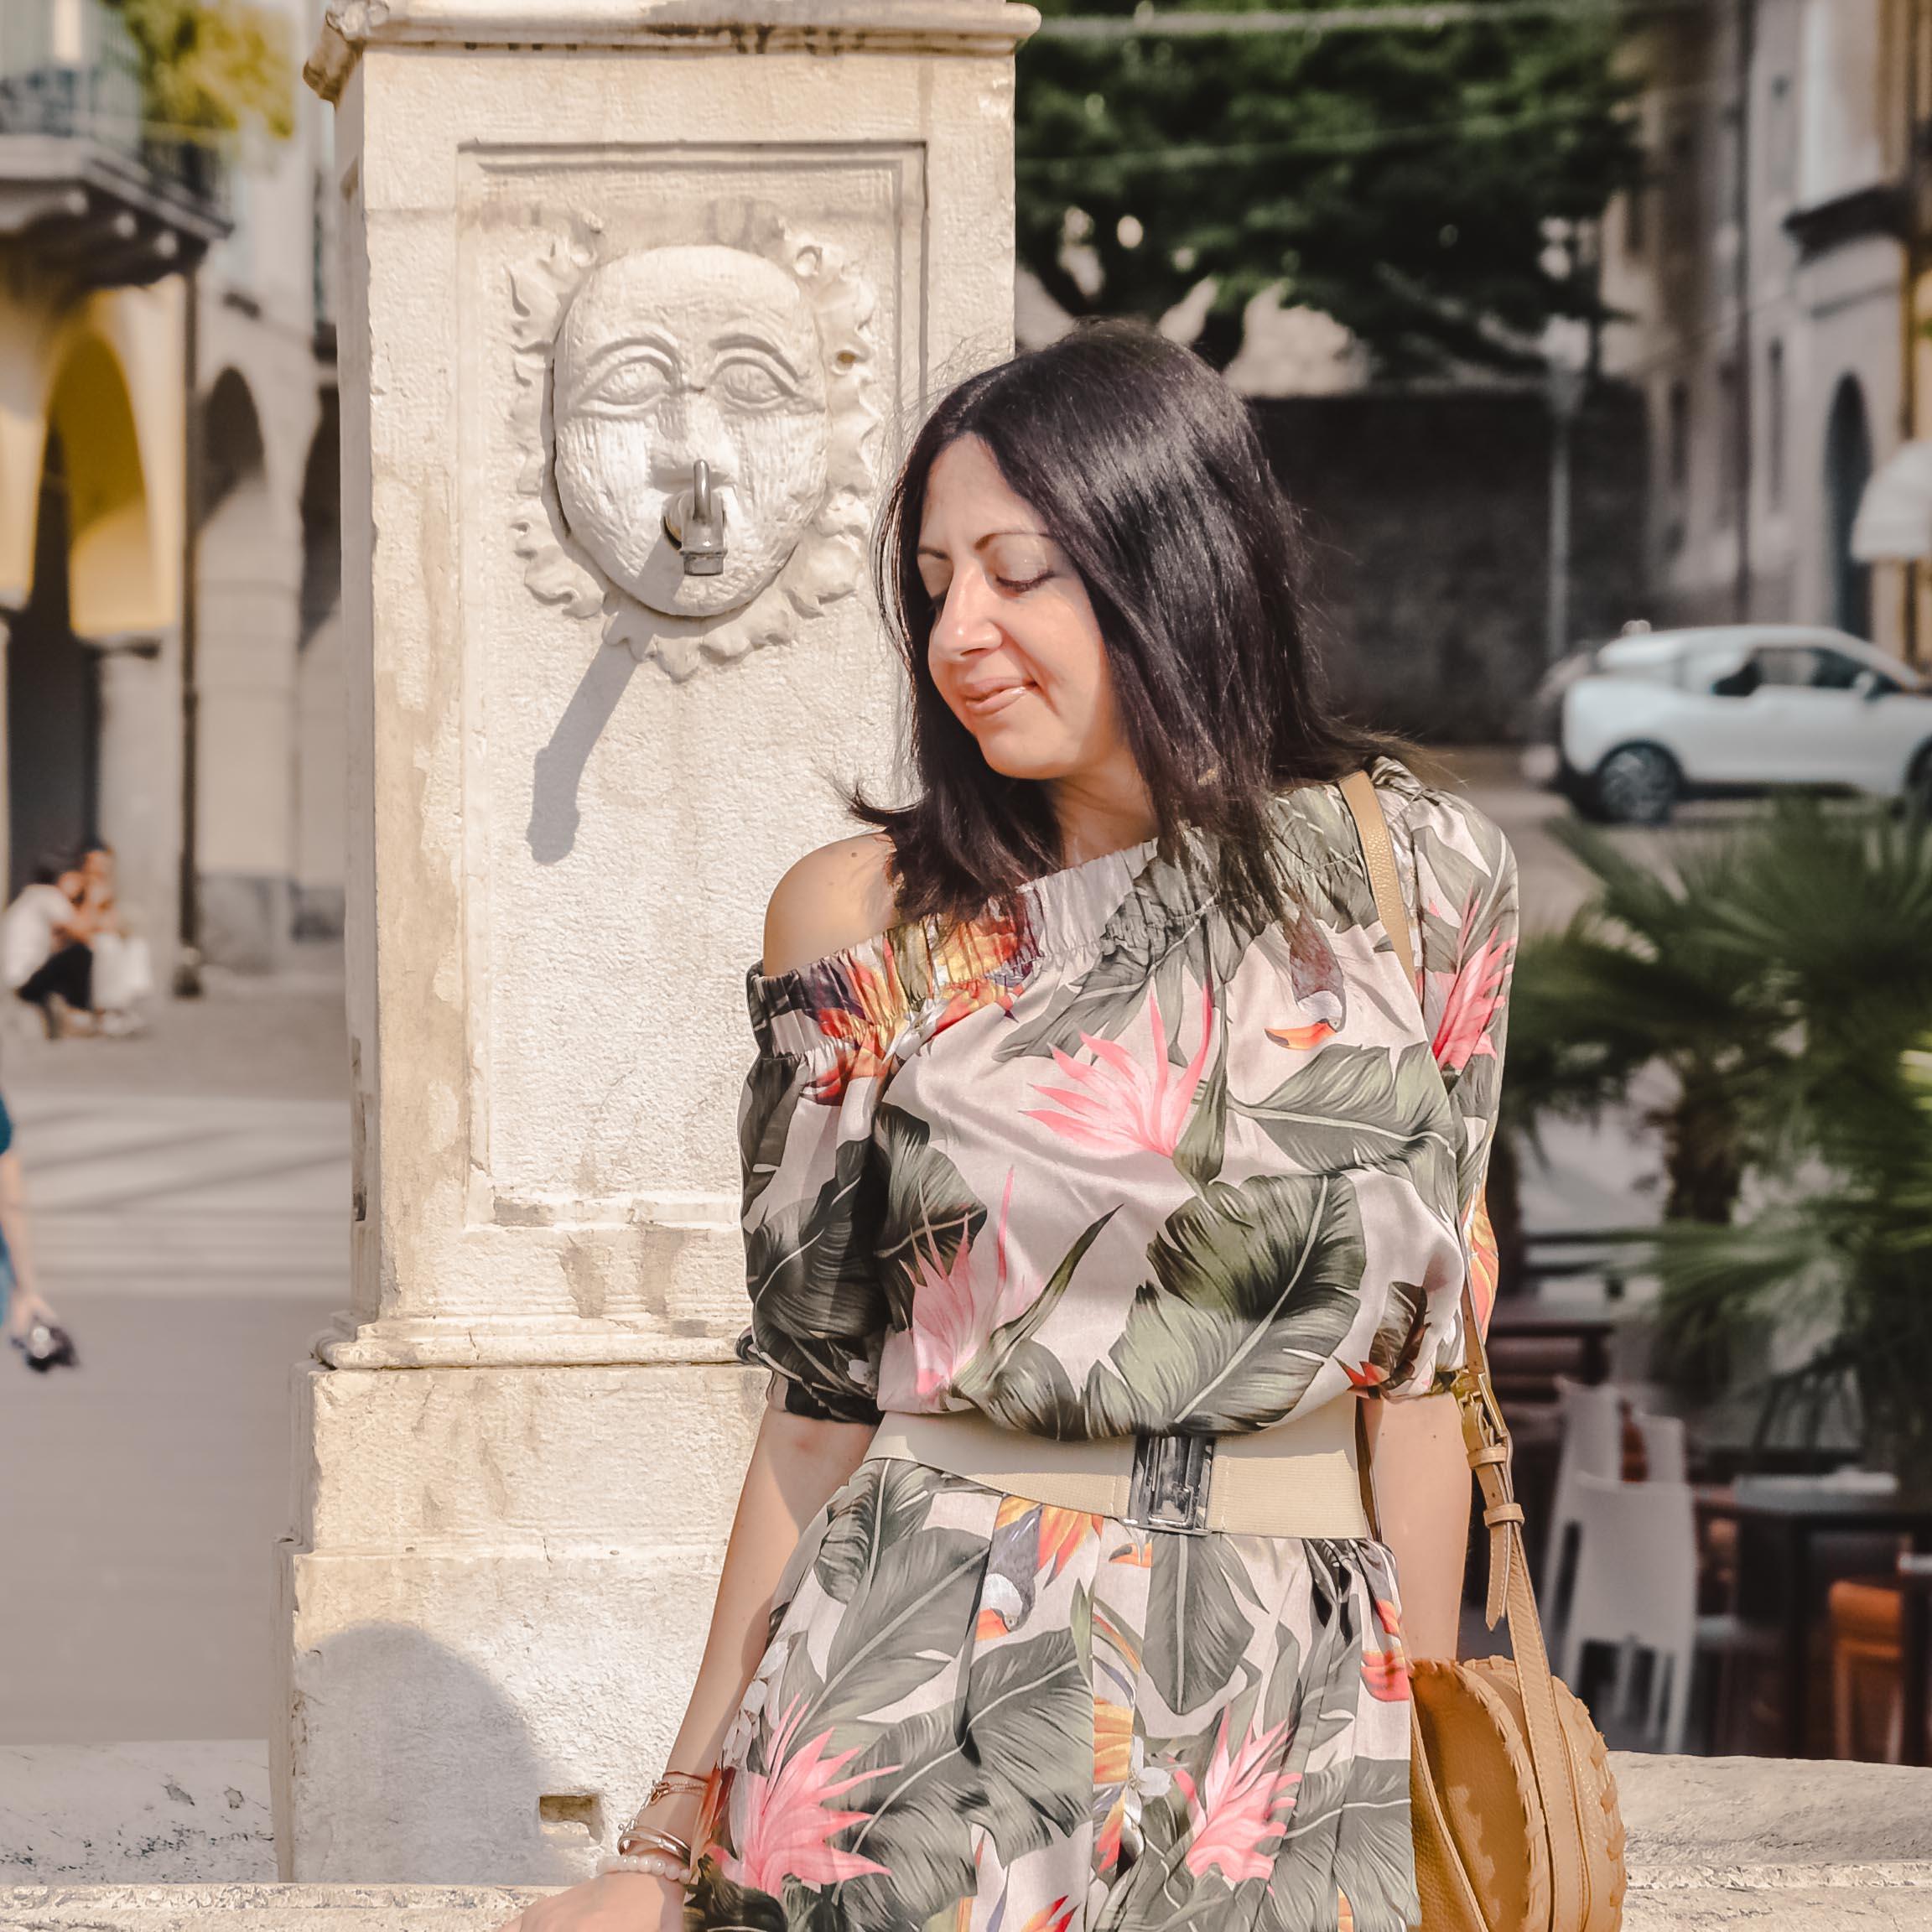 Stampe tropicali: come indossarle